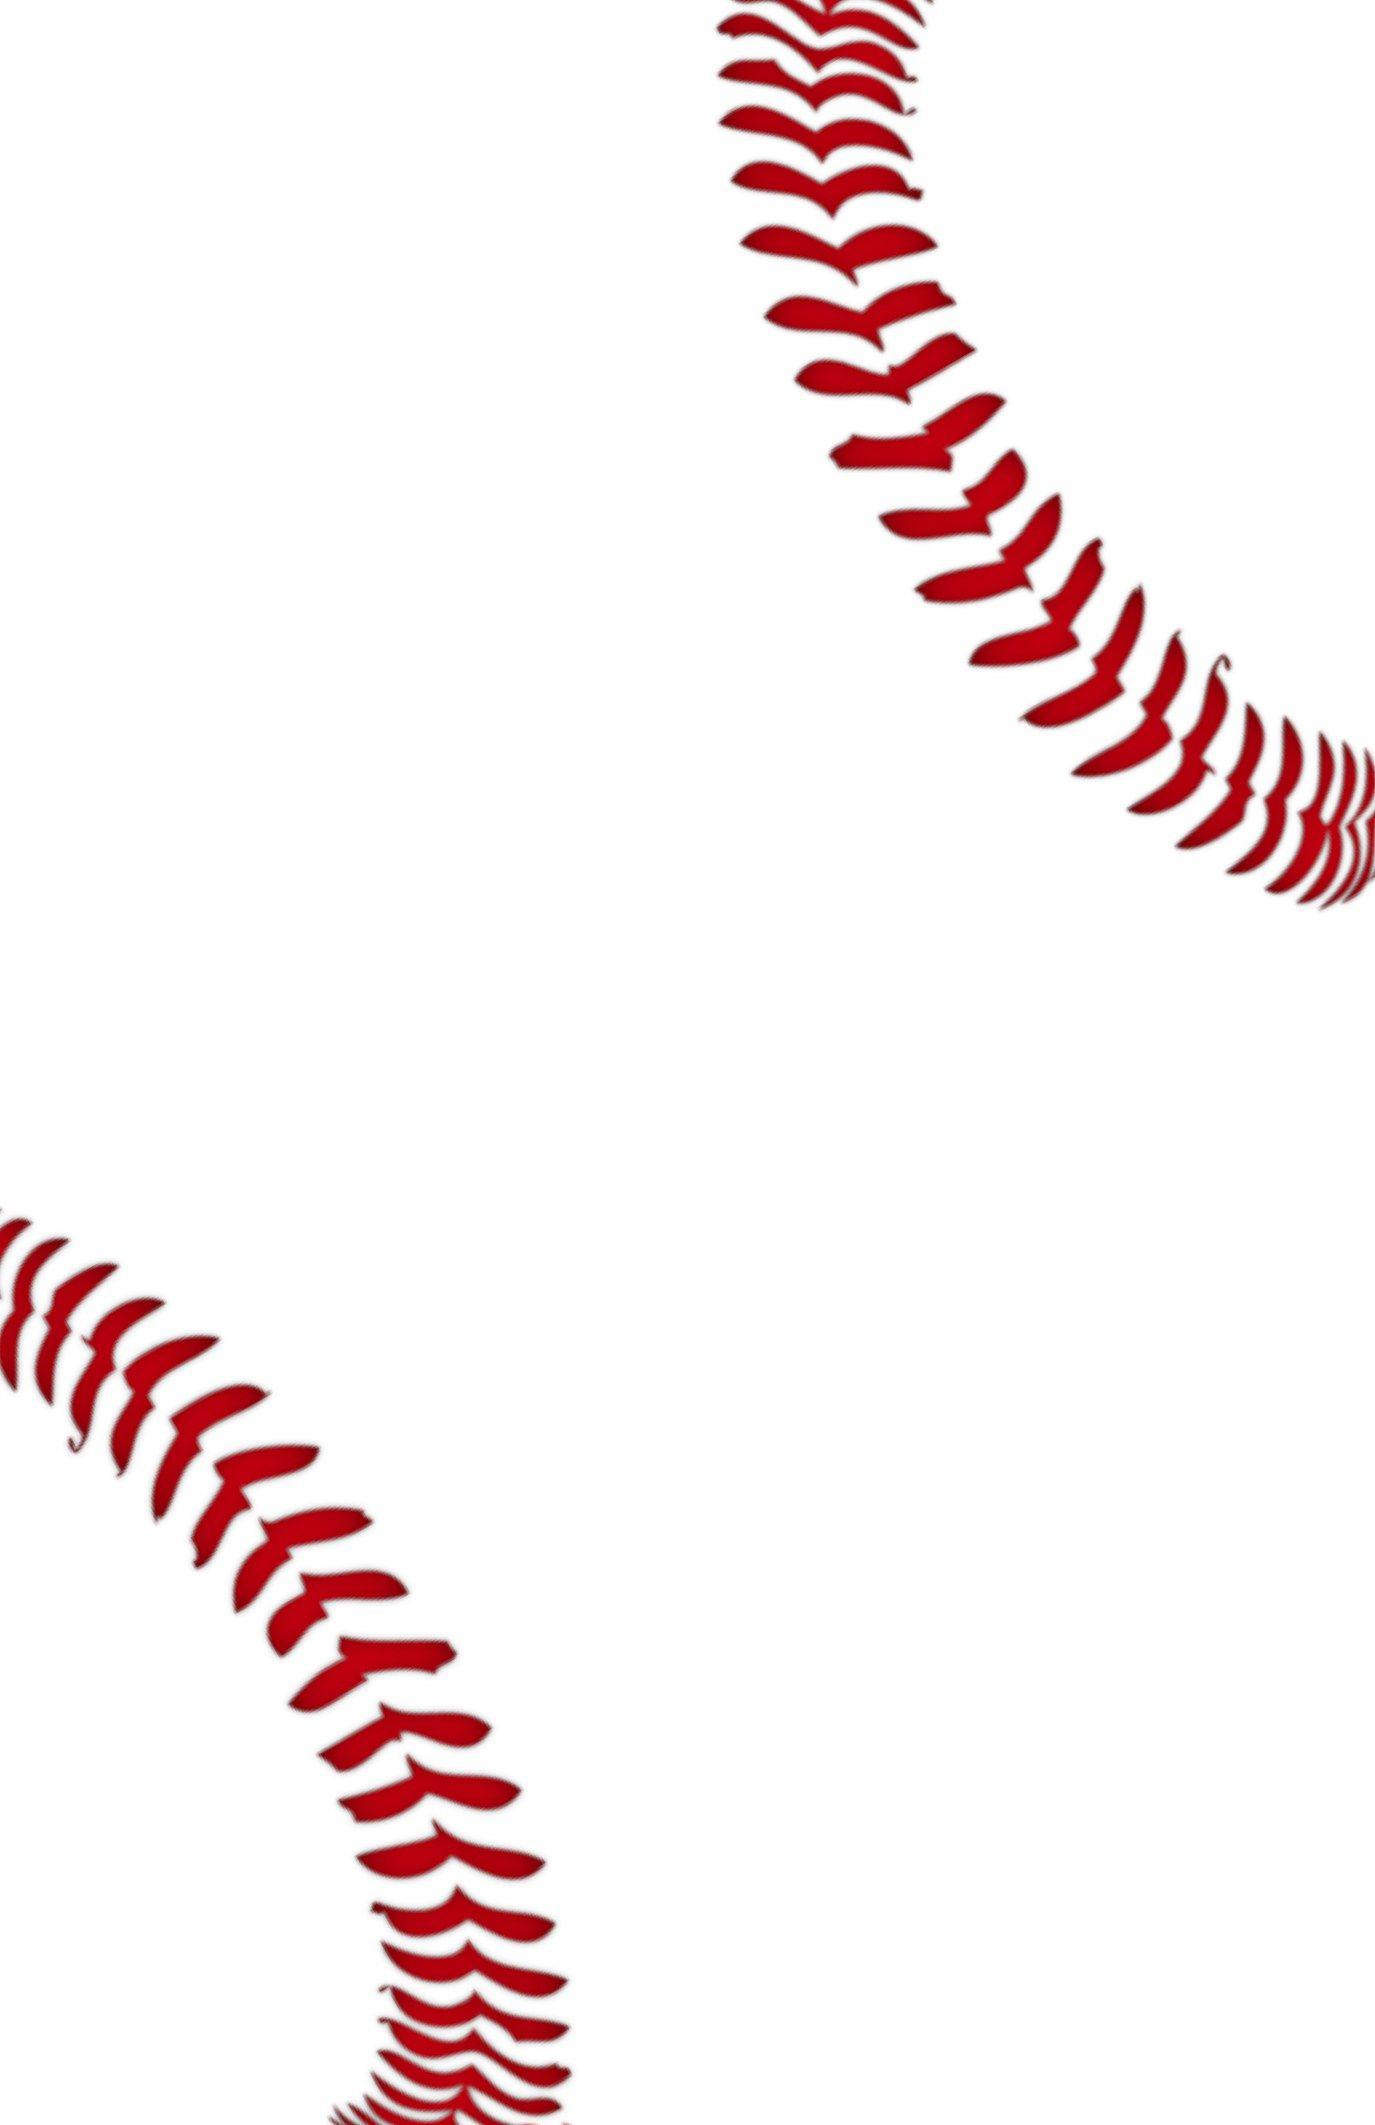 Baseball Party Invitations Free Printable | Birthday Party's - Free Printable Sports Birthday Invitation Templates